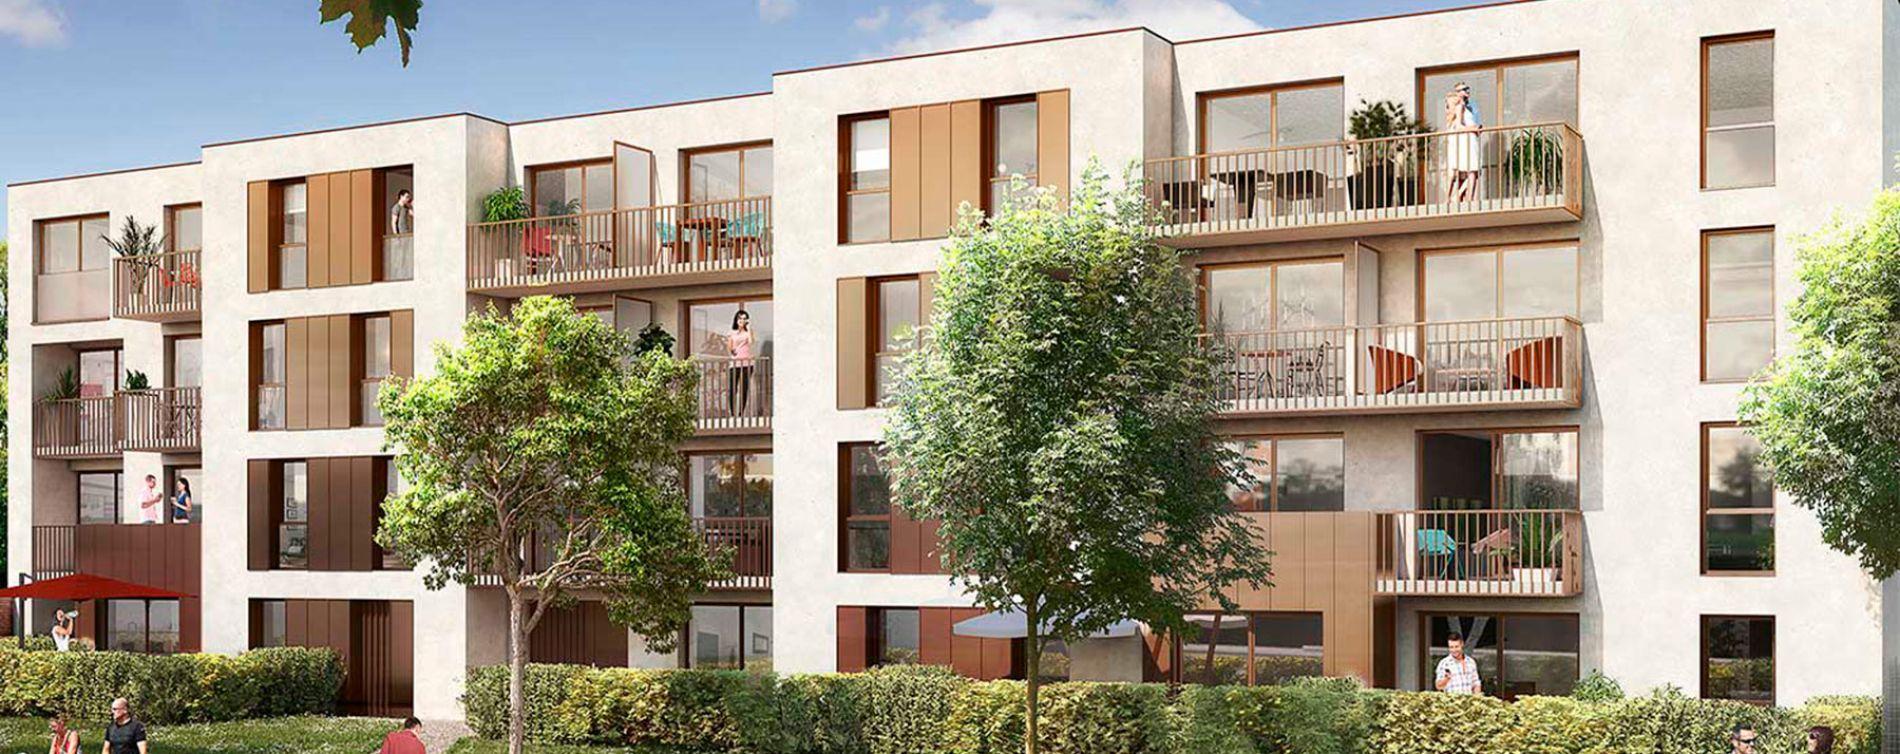 Wattignies : programme immobilier neuve « Harmony » (2)